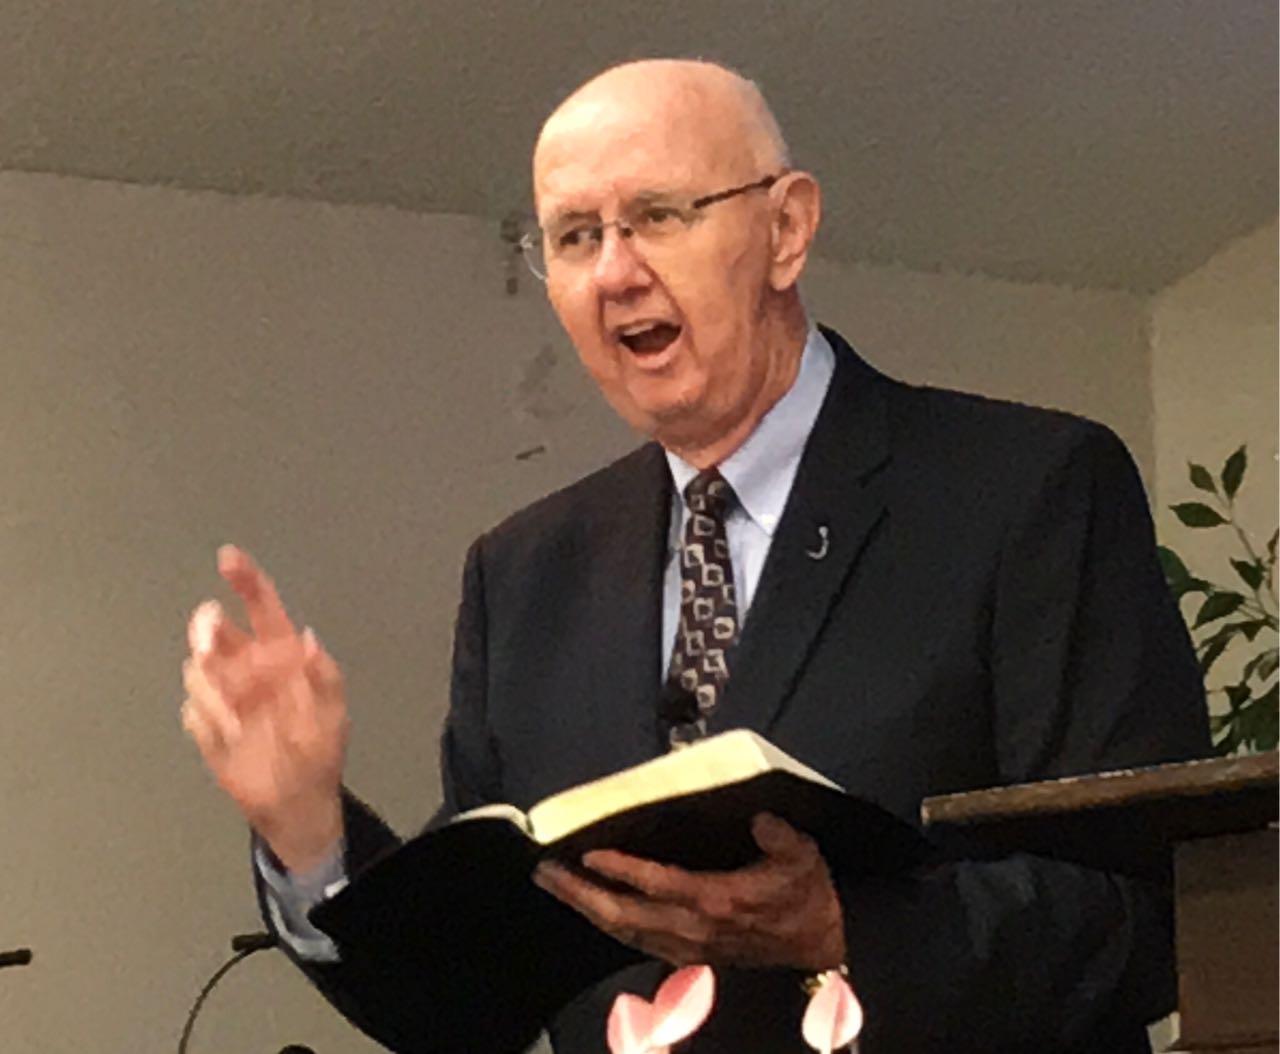 Pastor Terry Lowe